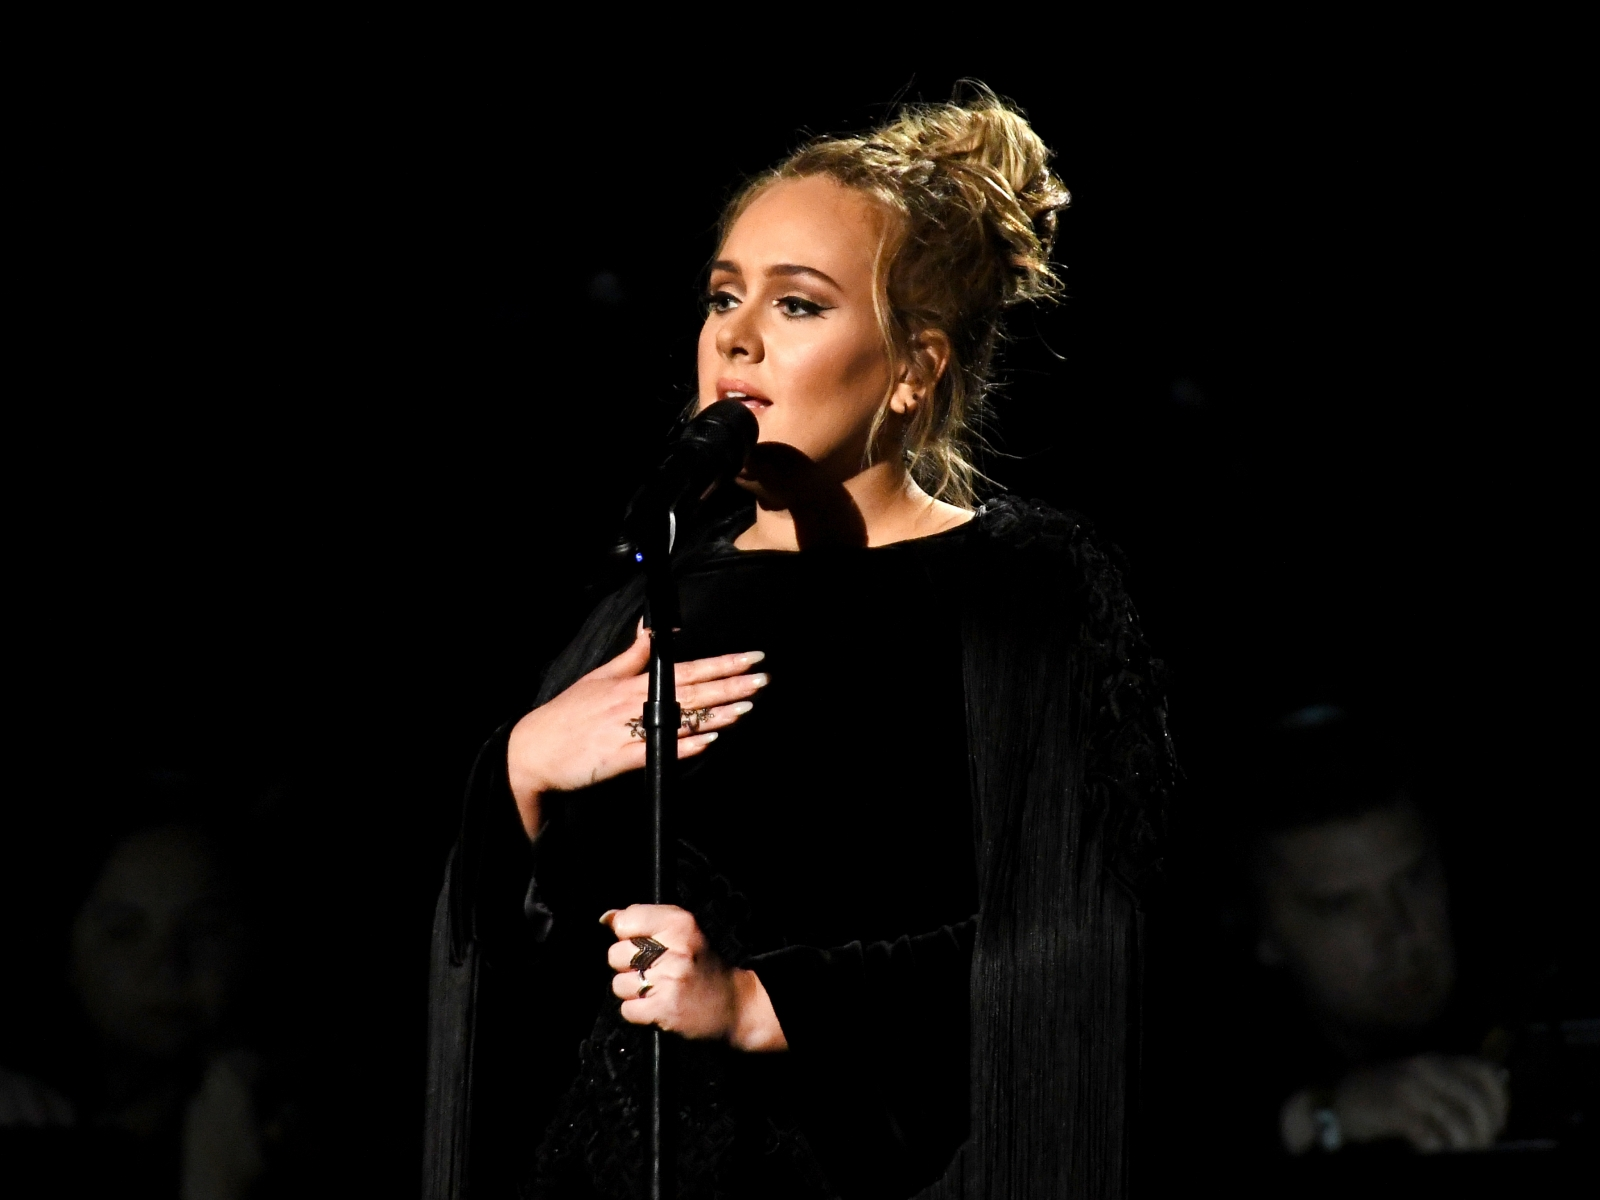 Adele performing